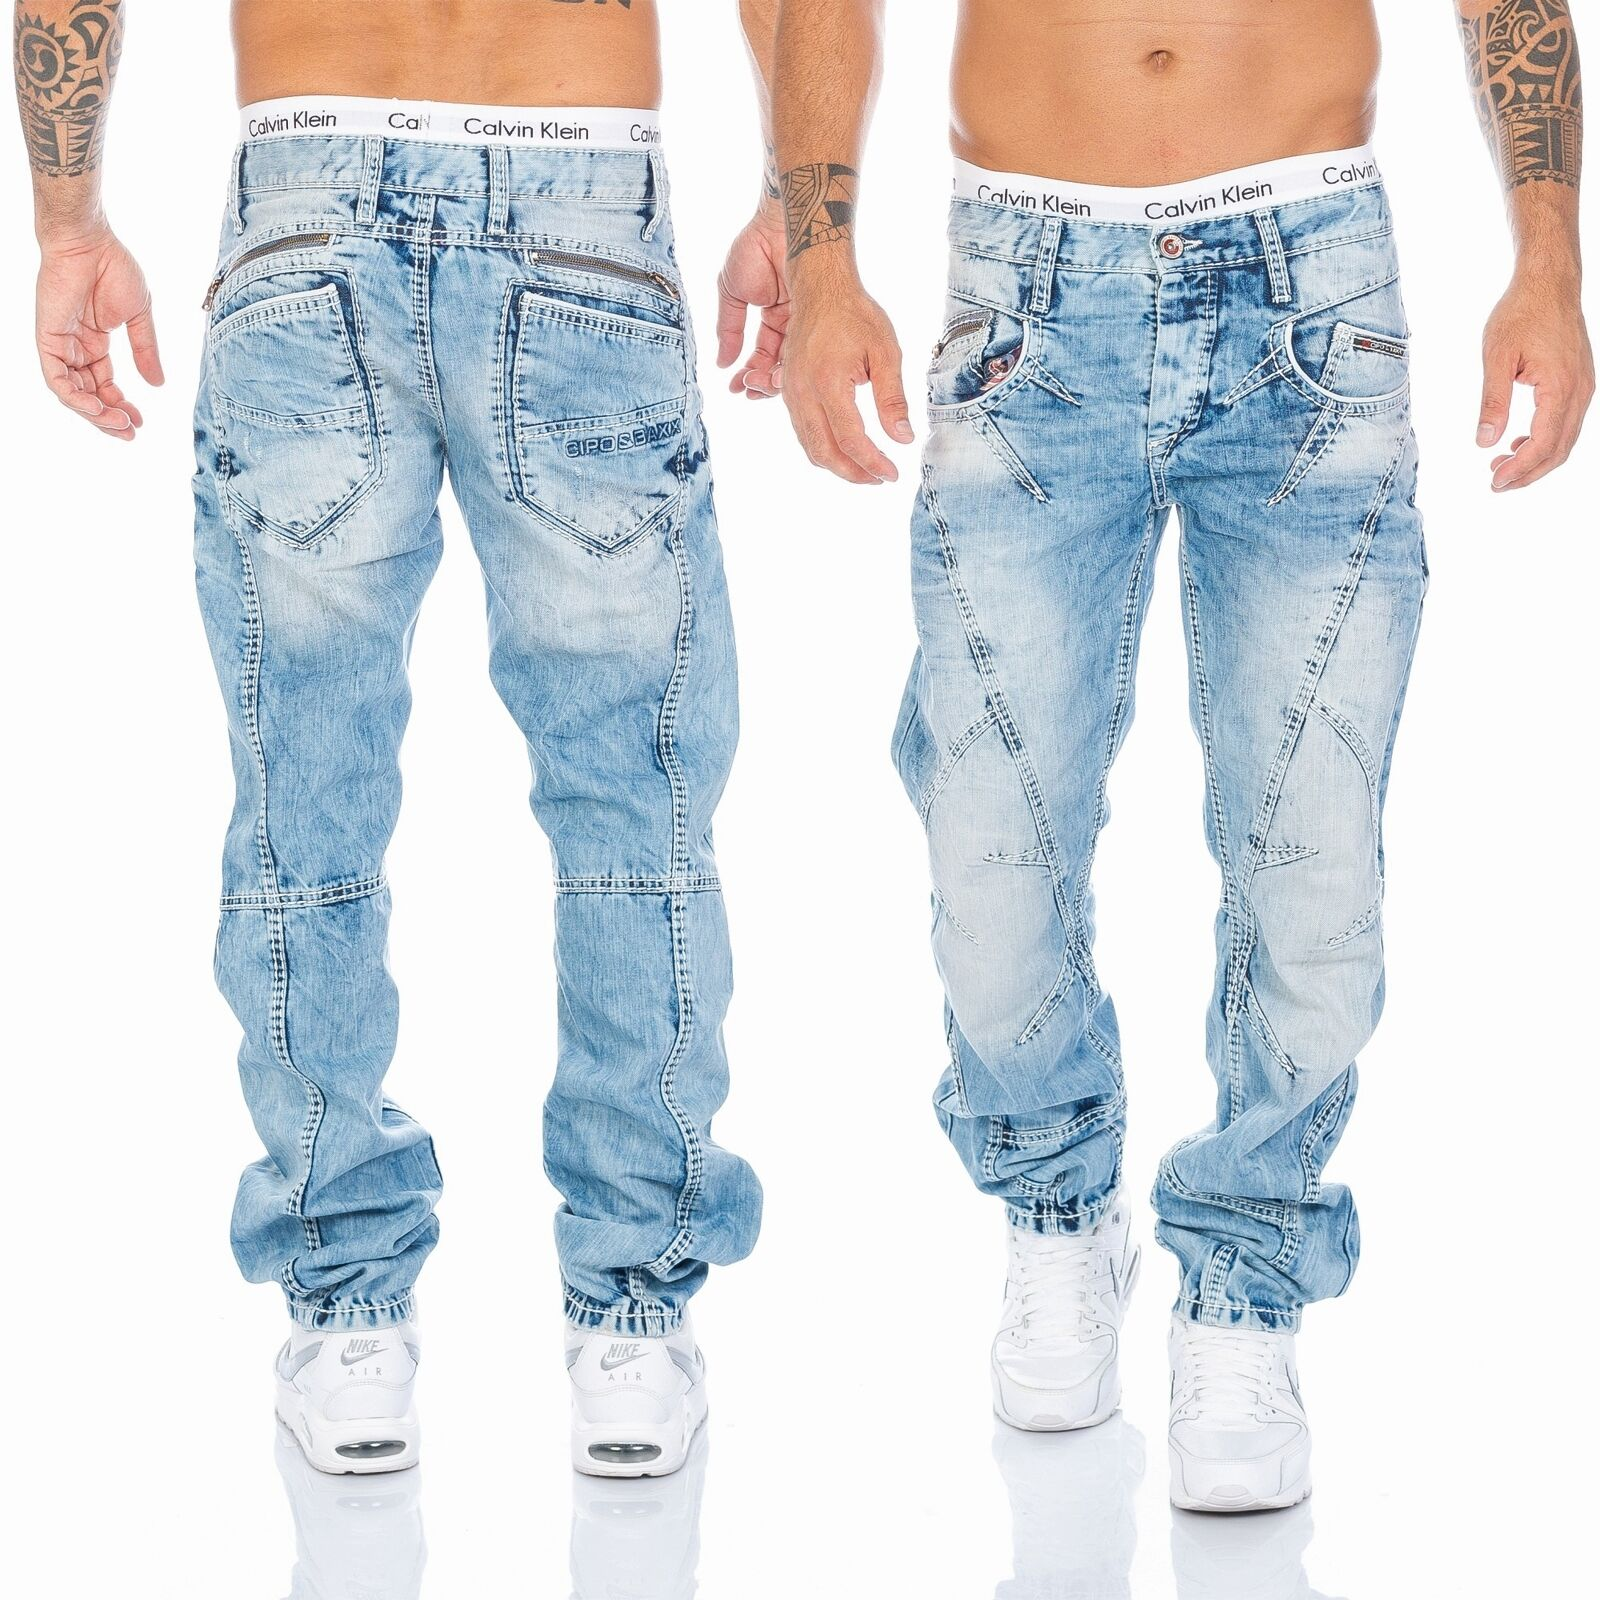 Neu Baxx 33 32 Hose 29 Nähte 894a Herren Jeans Blue 31 Cipoamp; 30 W28 CrdxeBo